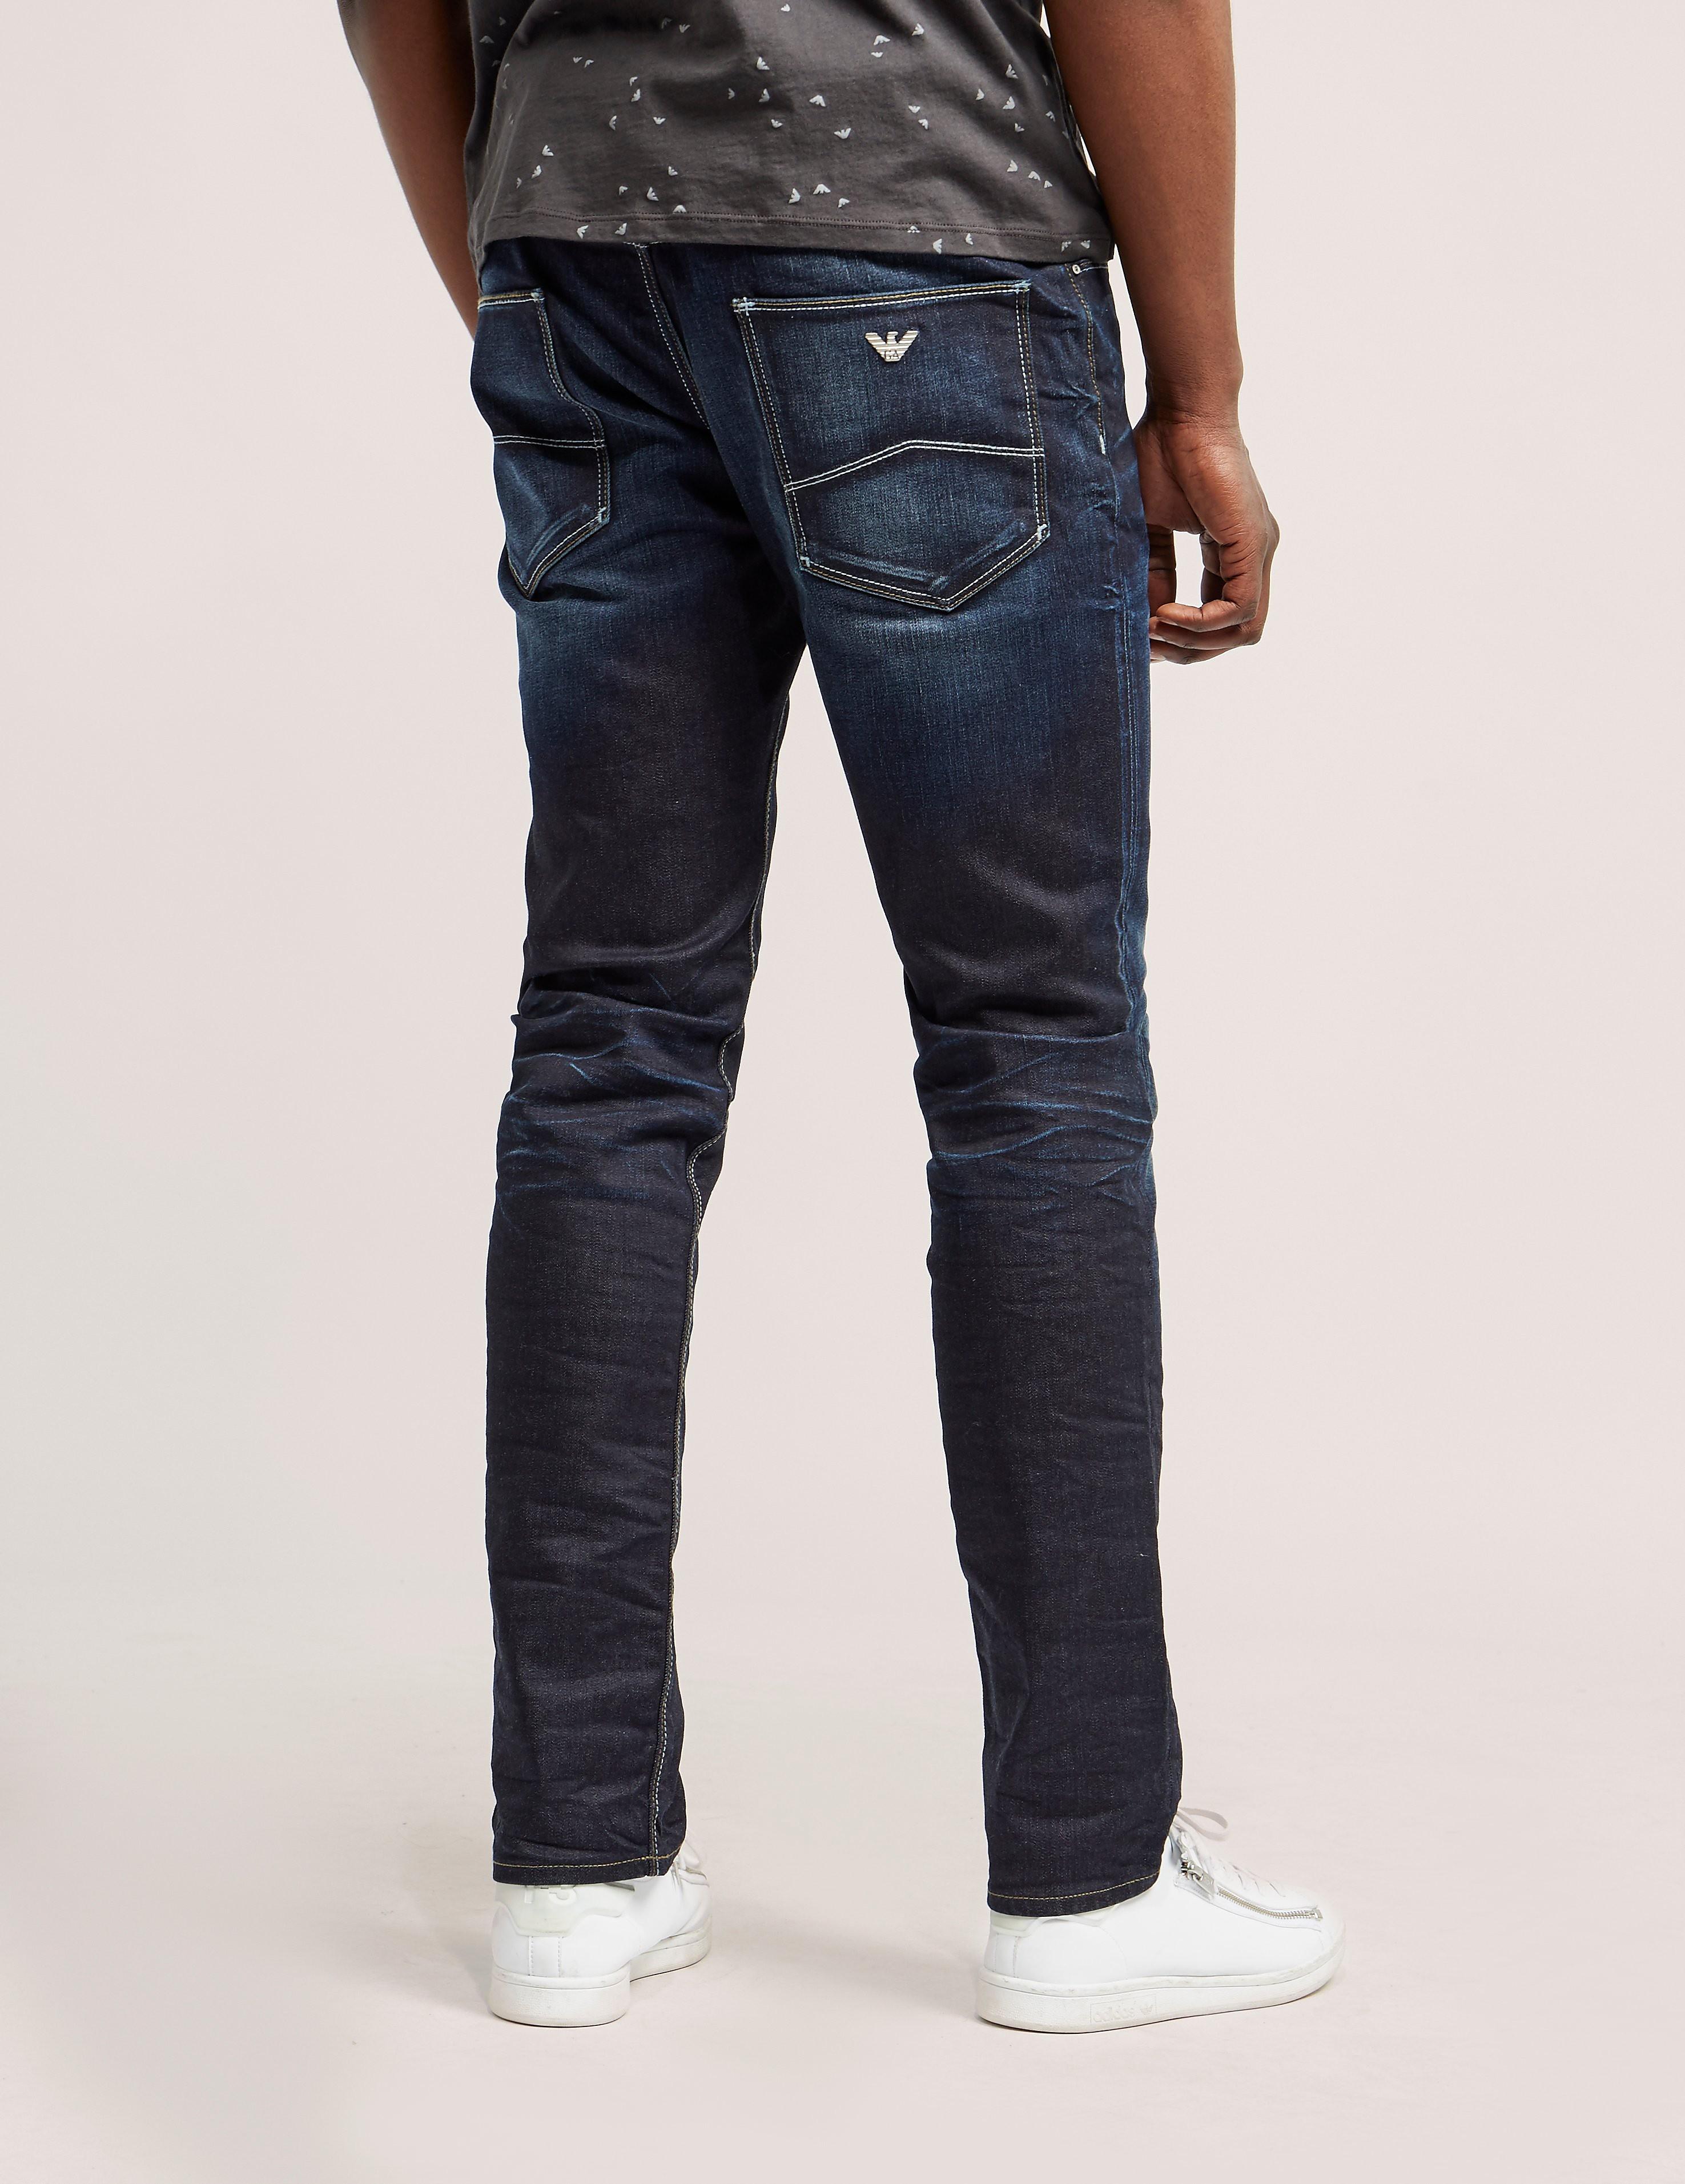 Armani Jeans J06 Jeans - Long